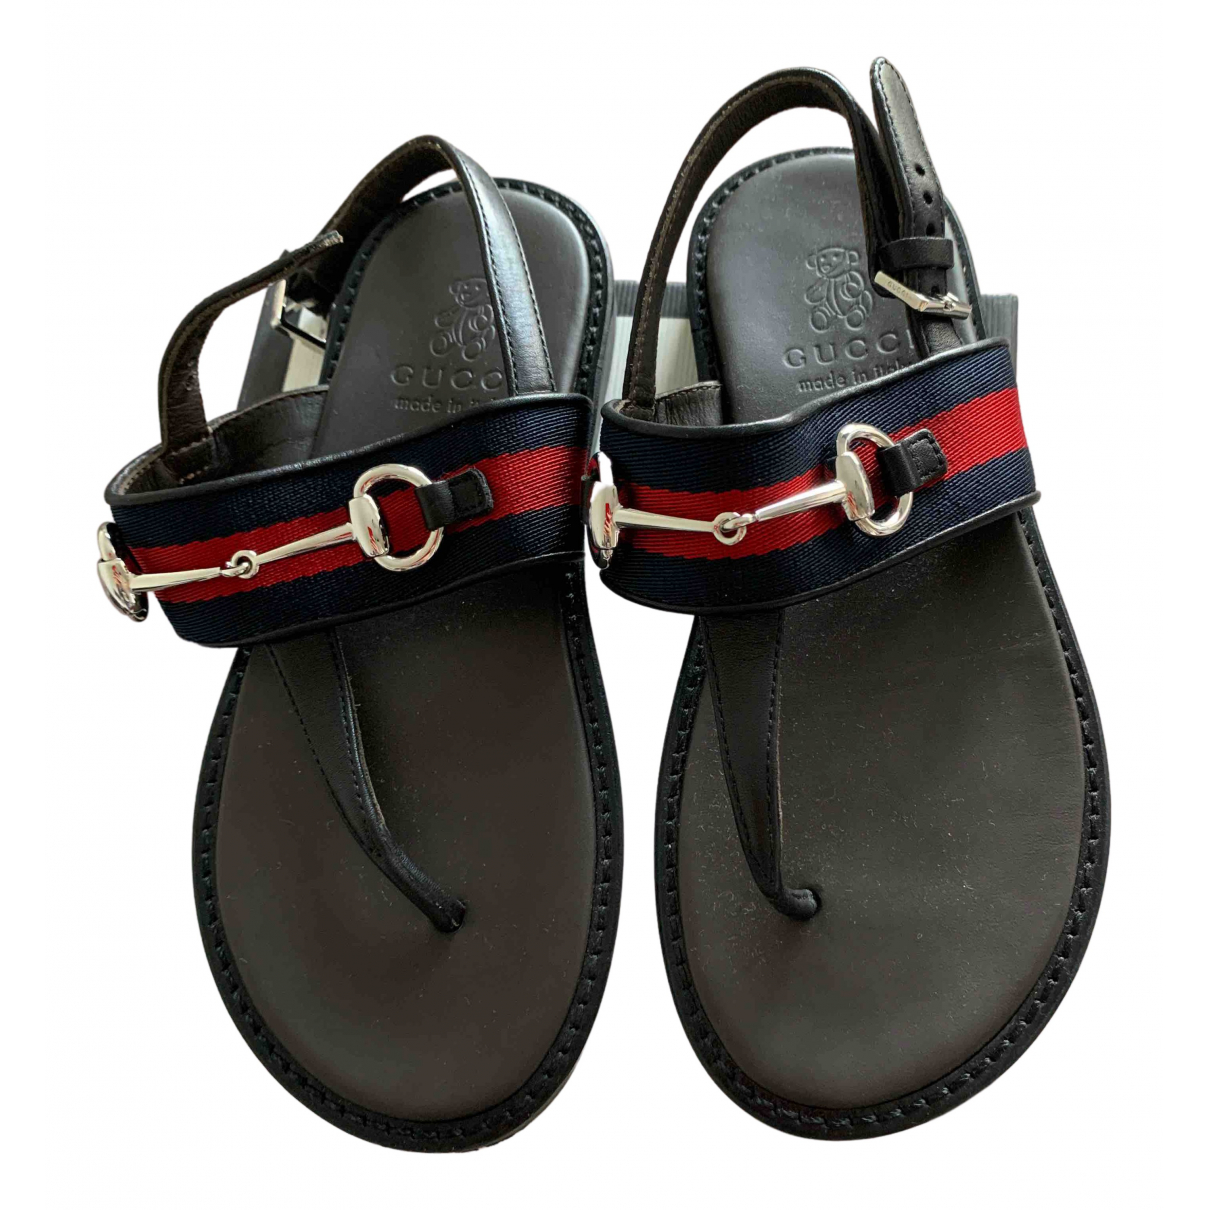 Gucci N Black Leather Sandals for Kids 29 FR